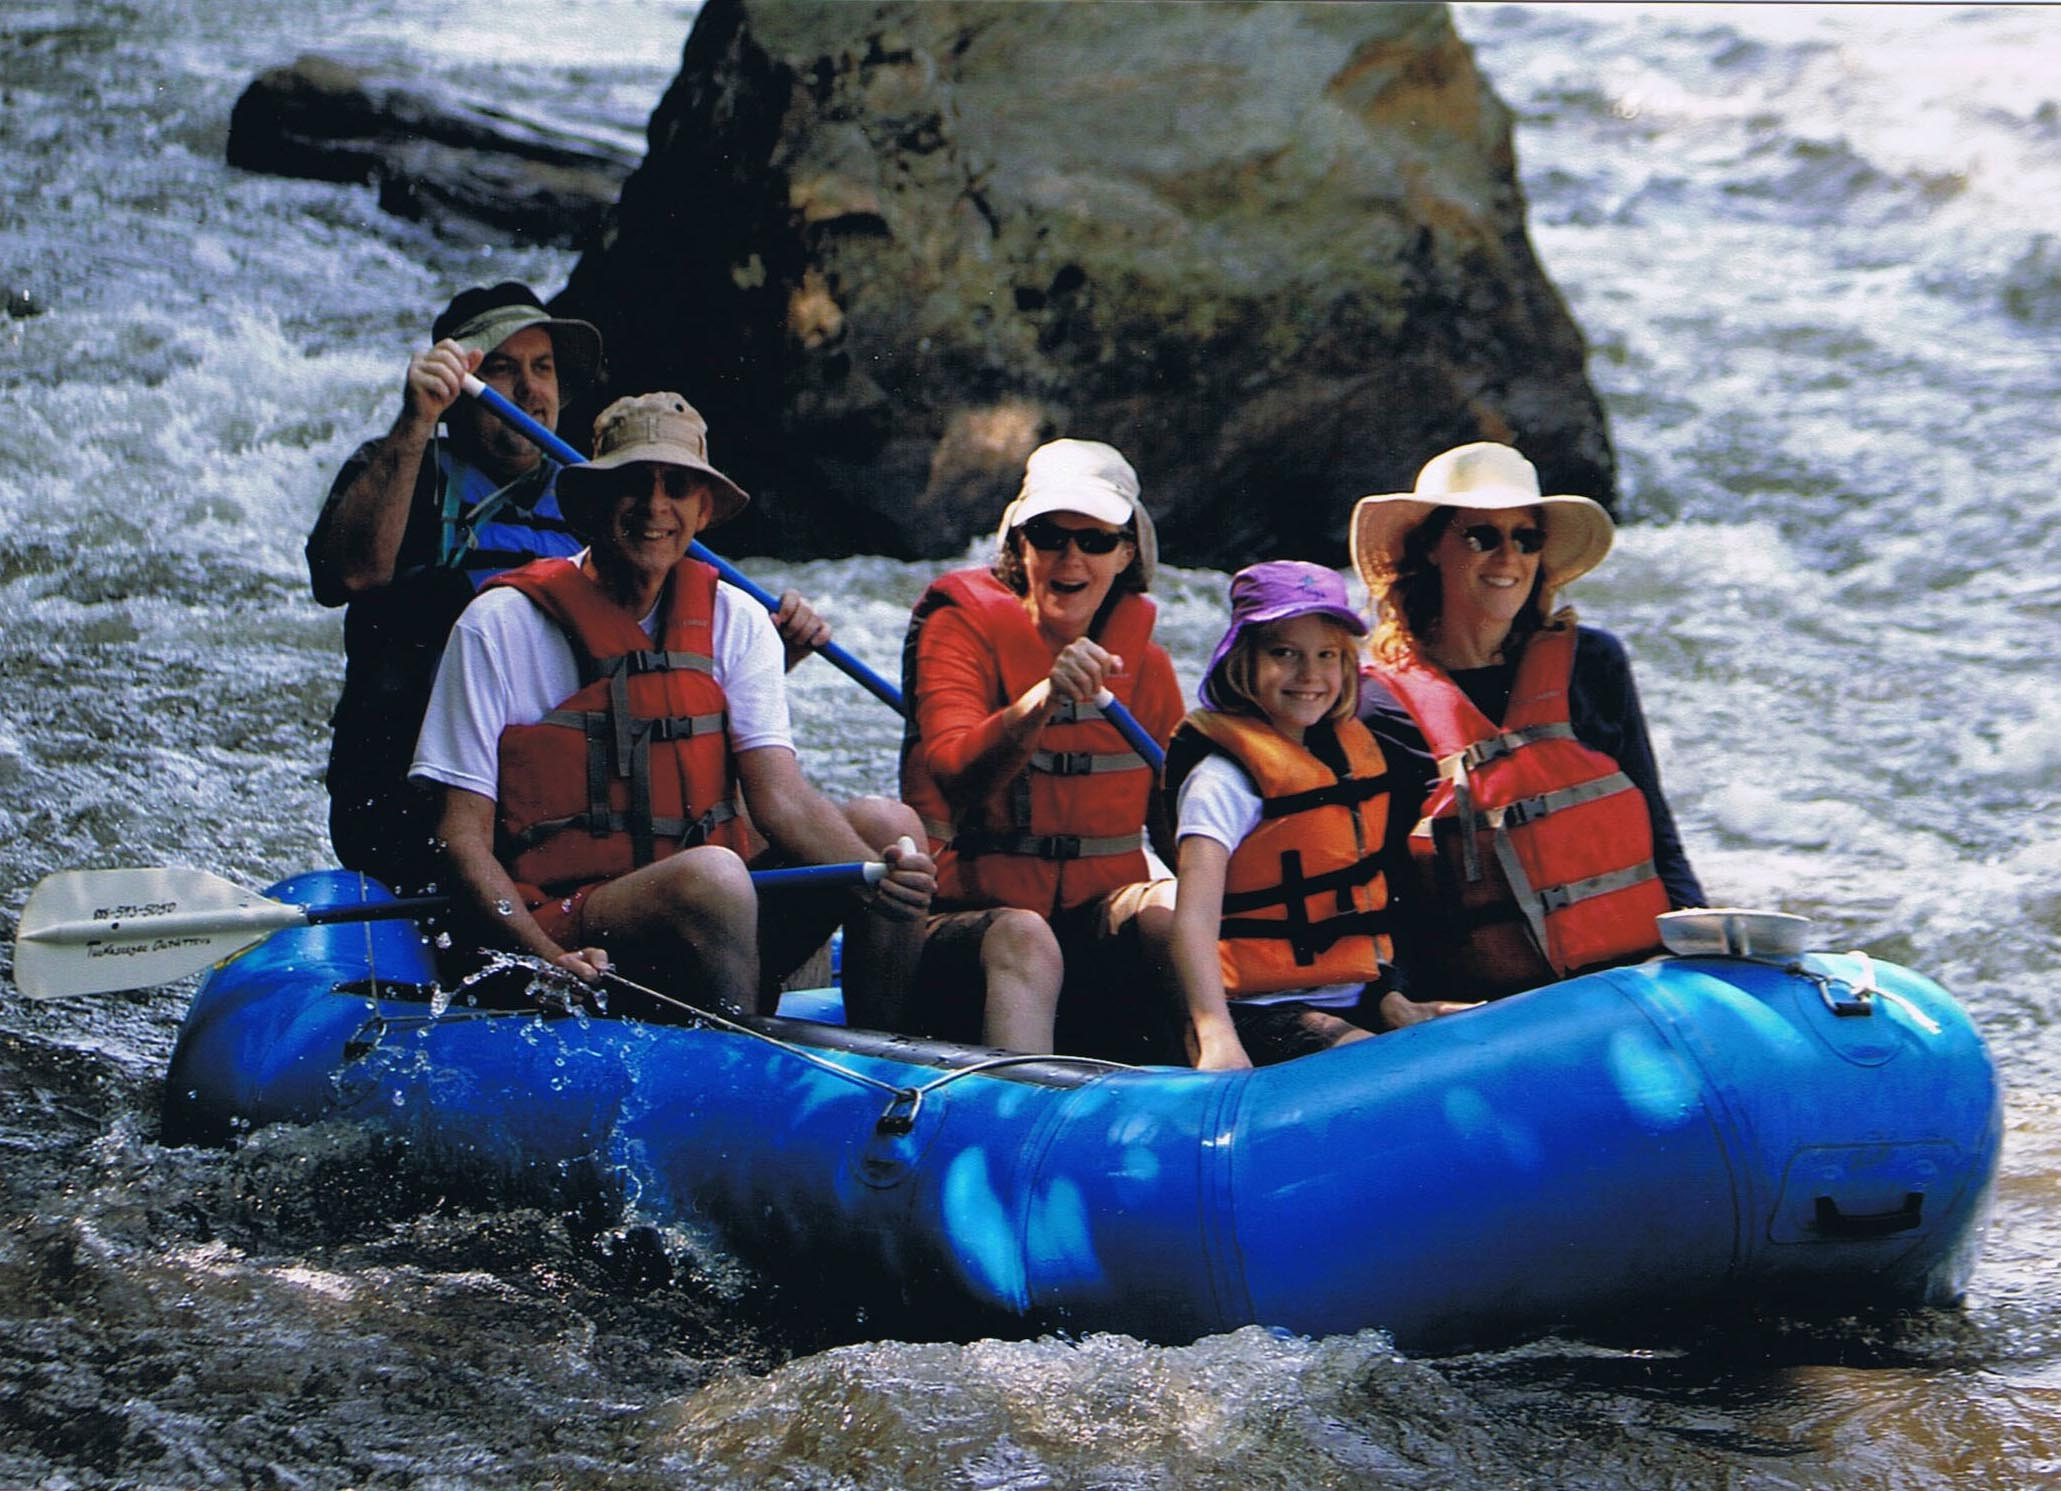 amenities_RiverRafting.jpg